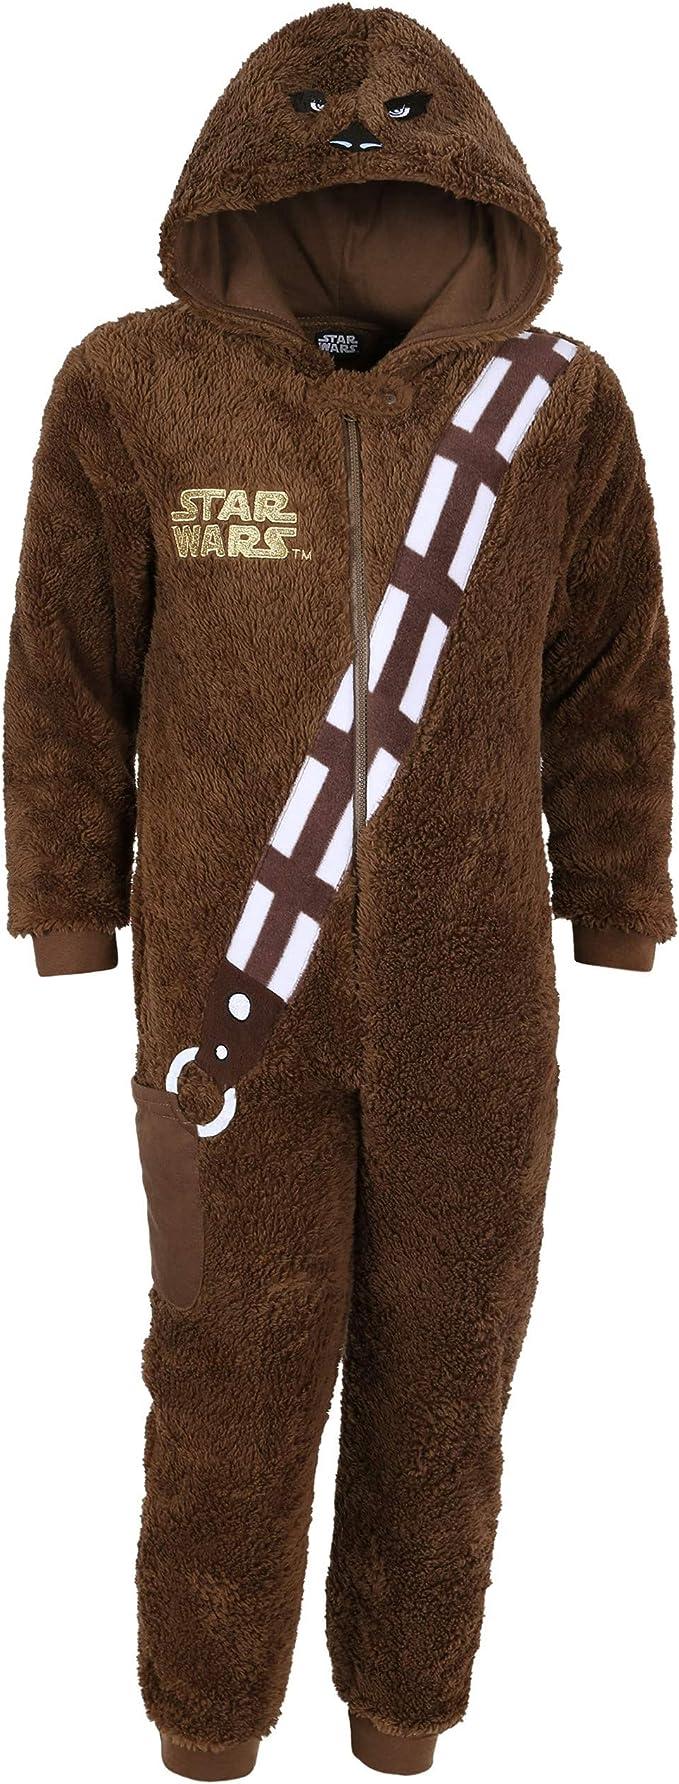 Star Wars -:- Disney -:- Pijama marrón Chewbacca